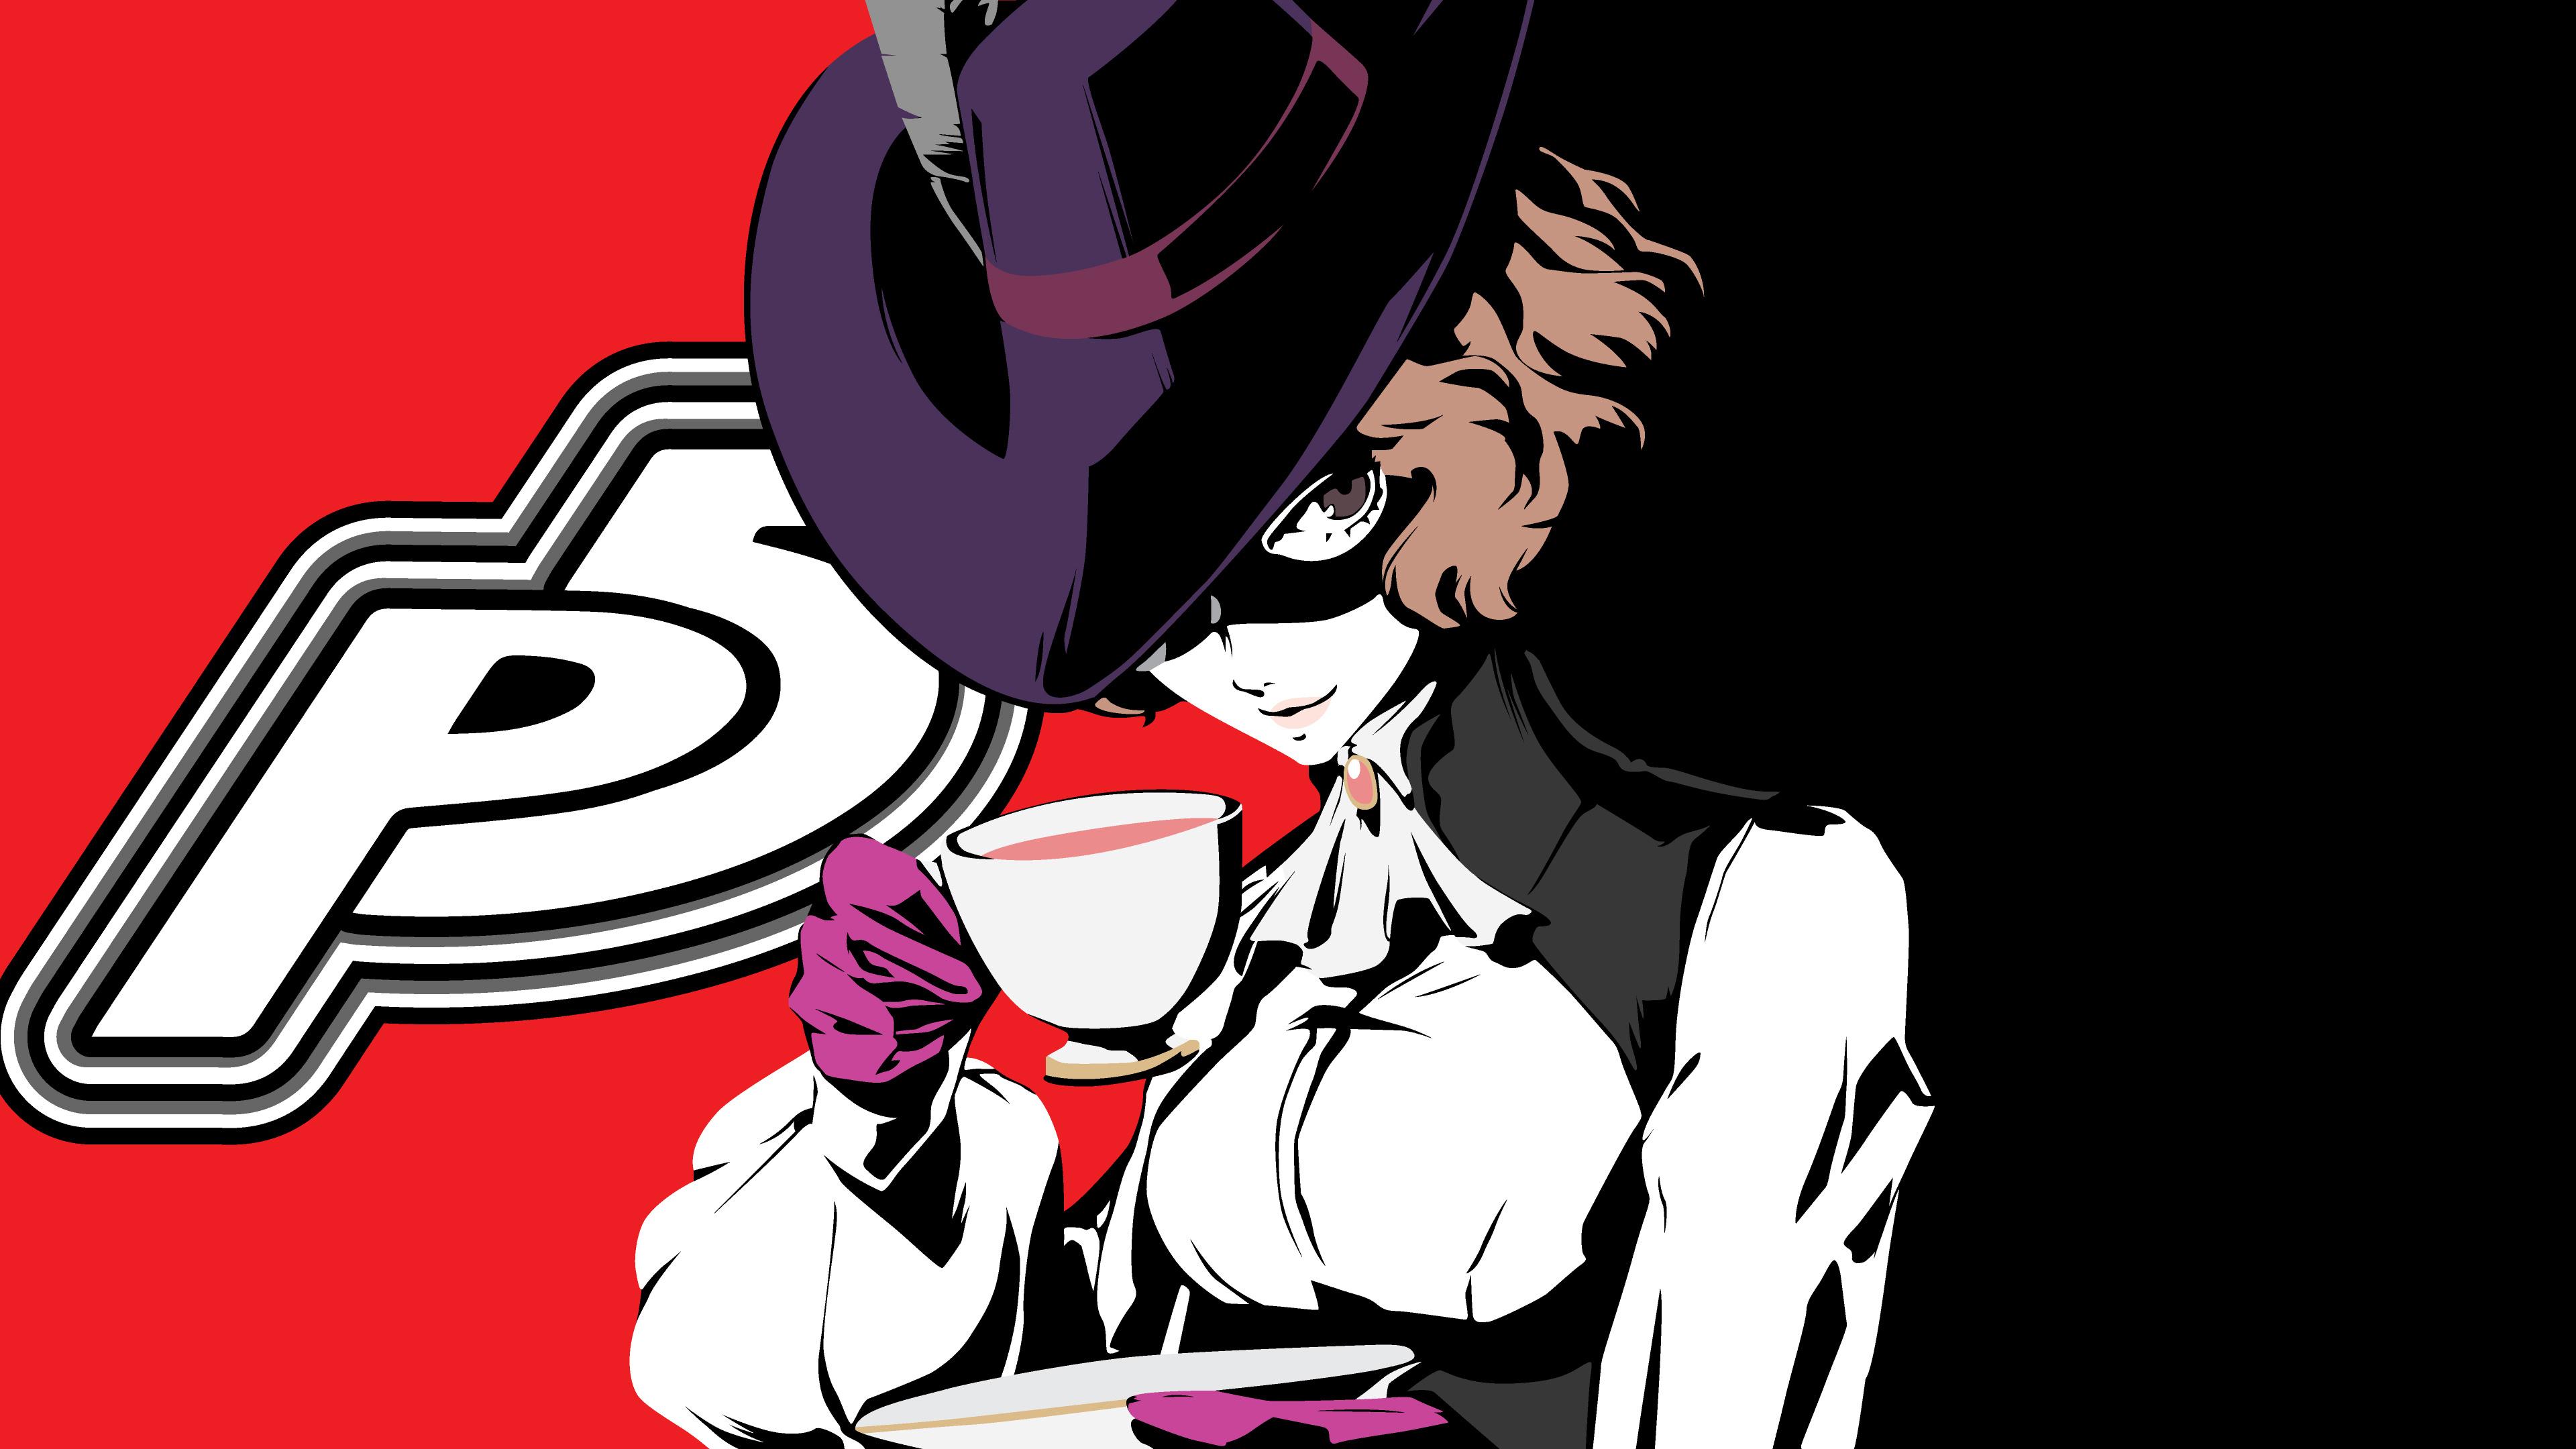 Anime girl, Persona 5, Video game, 3840x2160 wallpaper